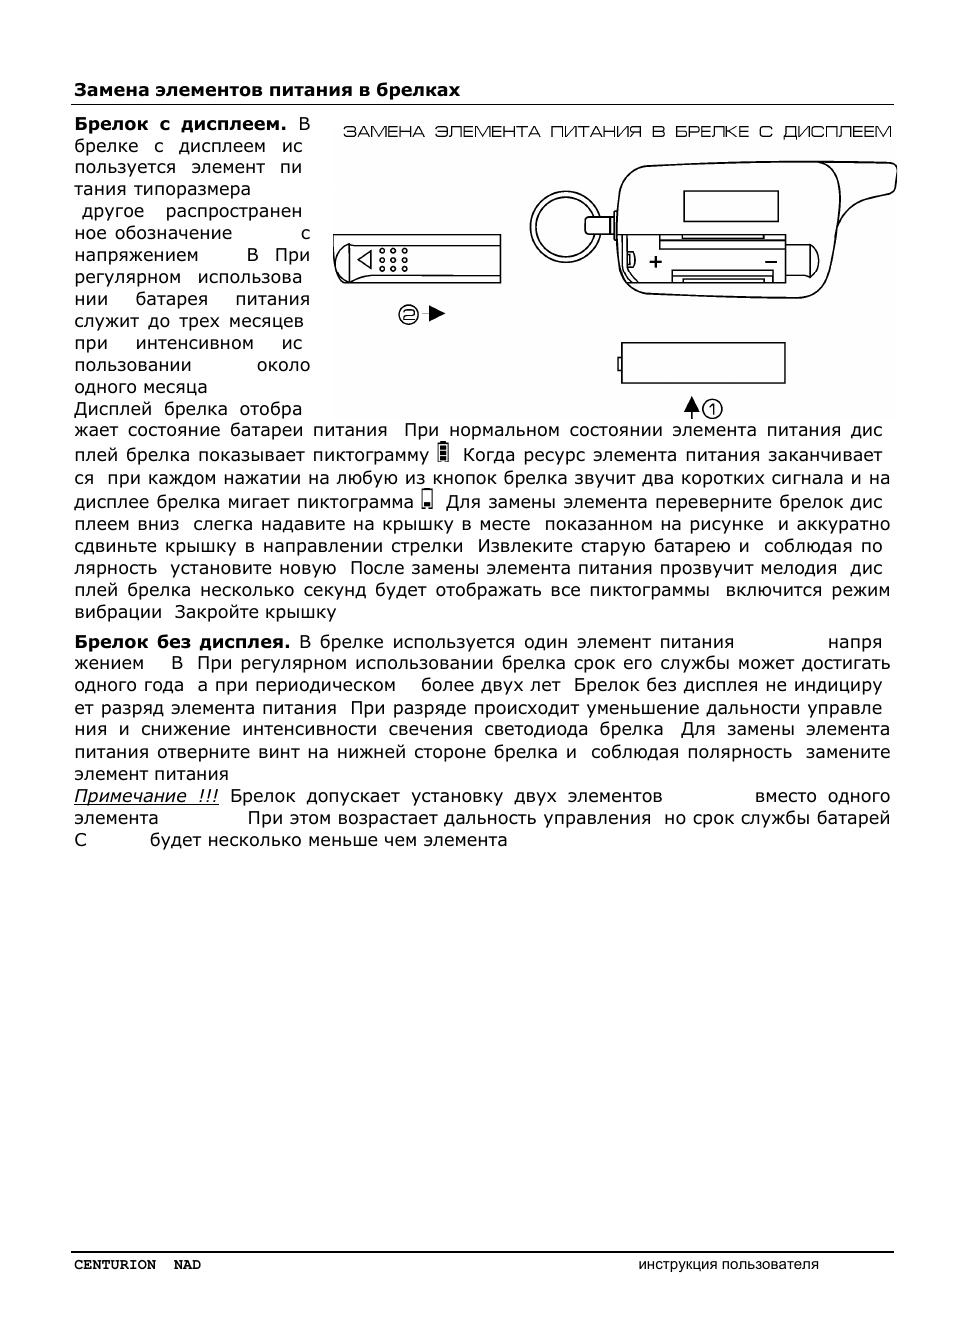 Centurion nad v2 инструкция